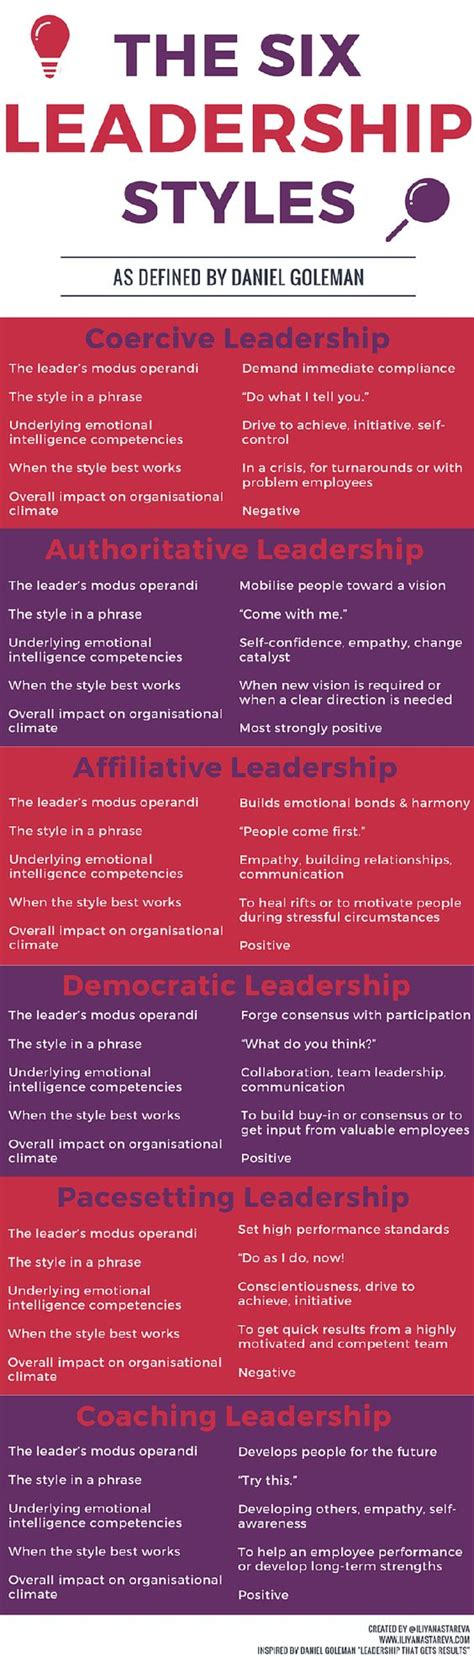 rwanda different management styles the six leadership styles infographic human resource